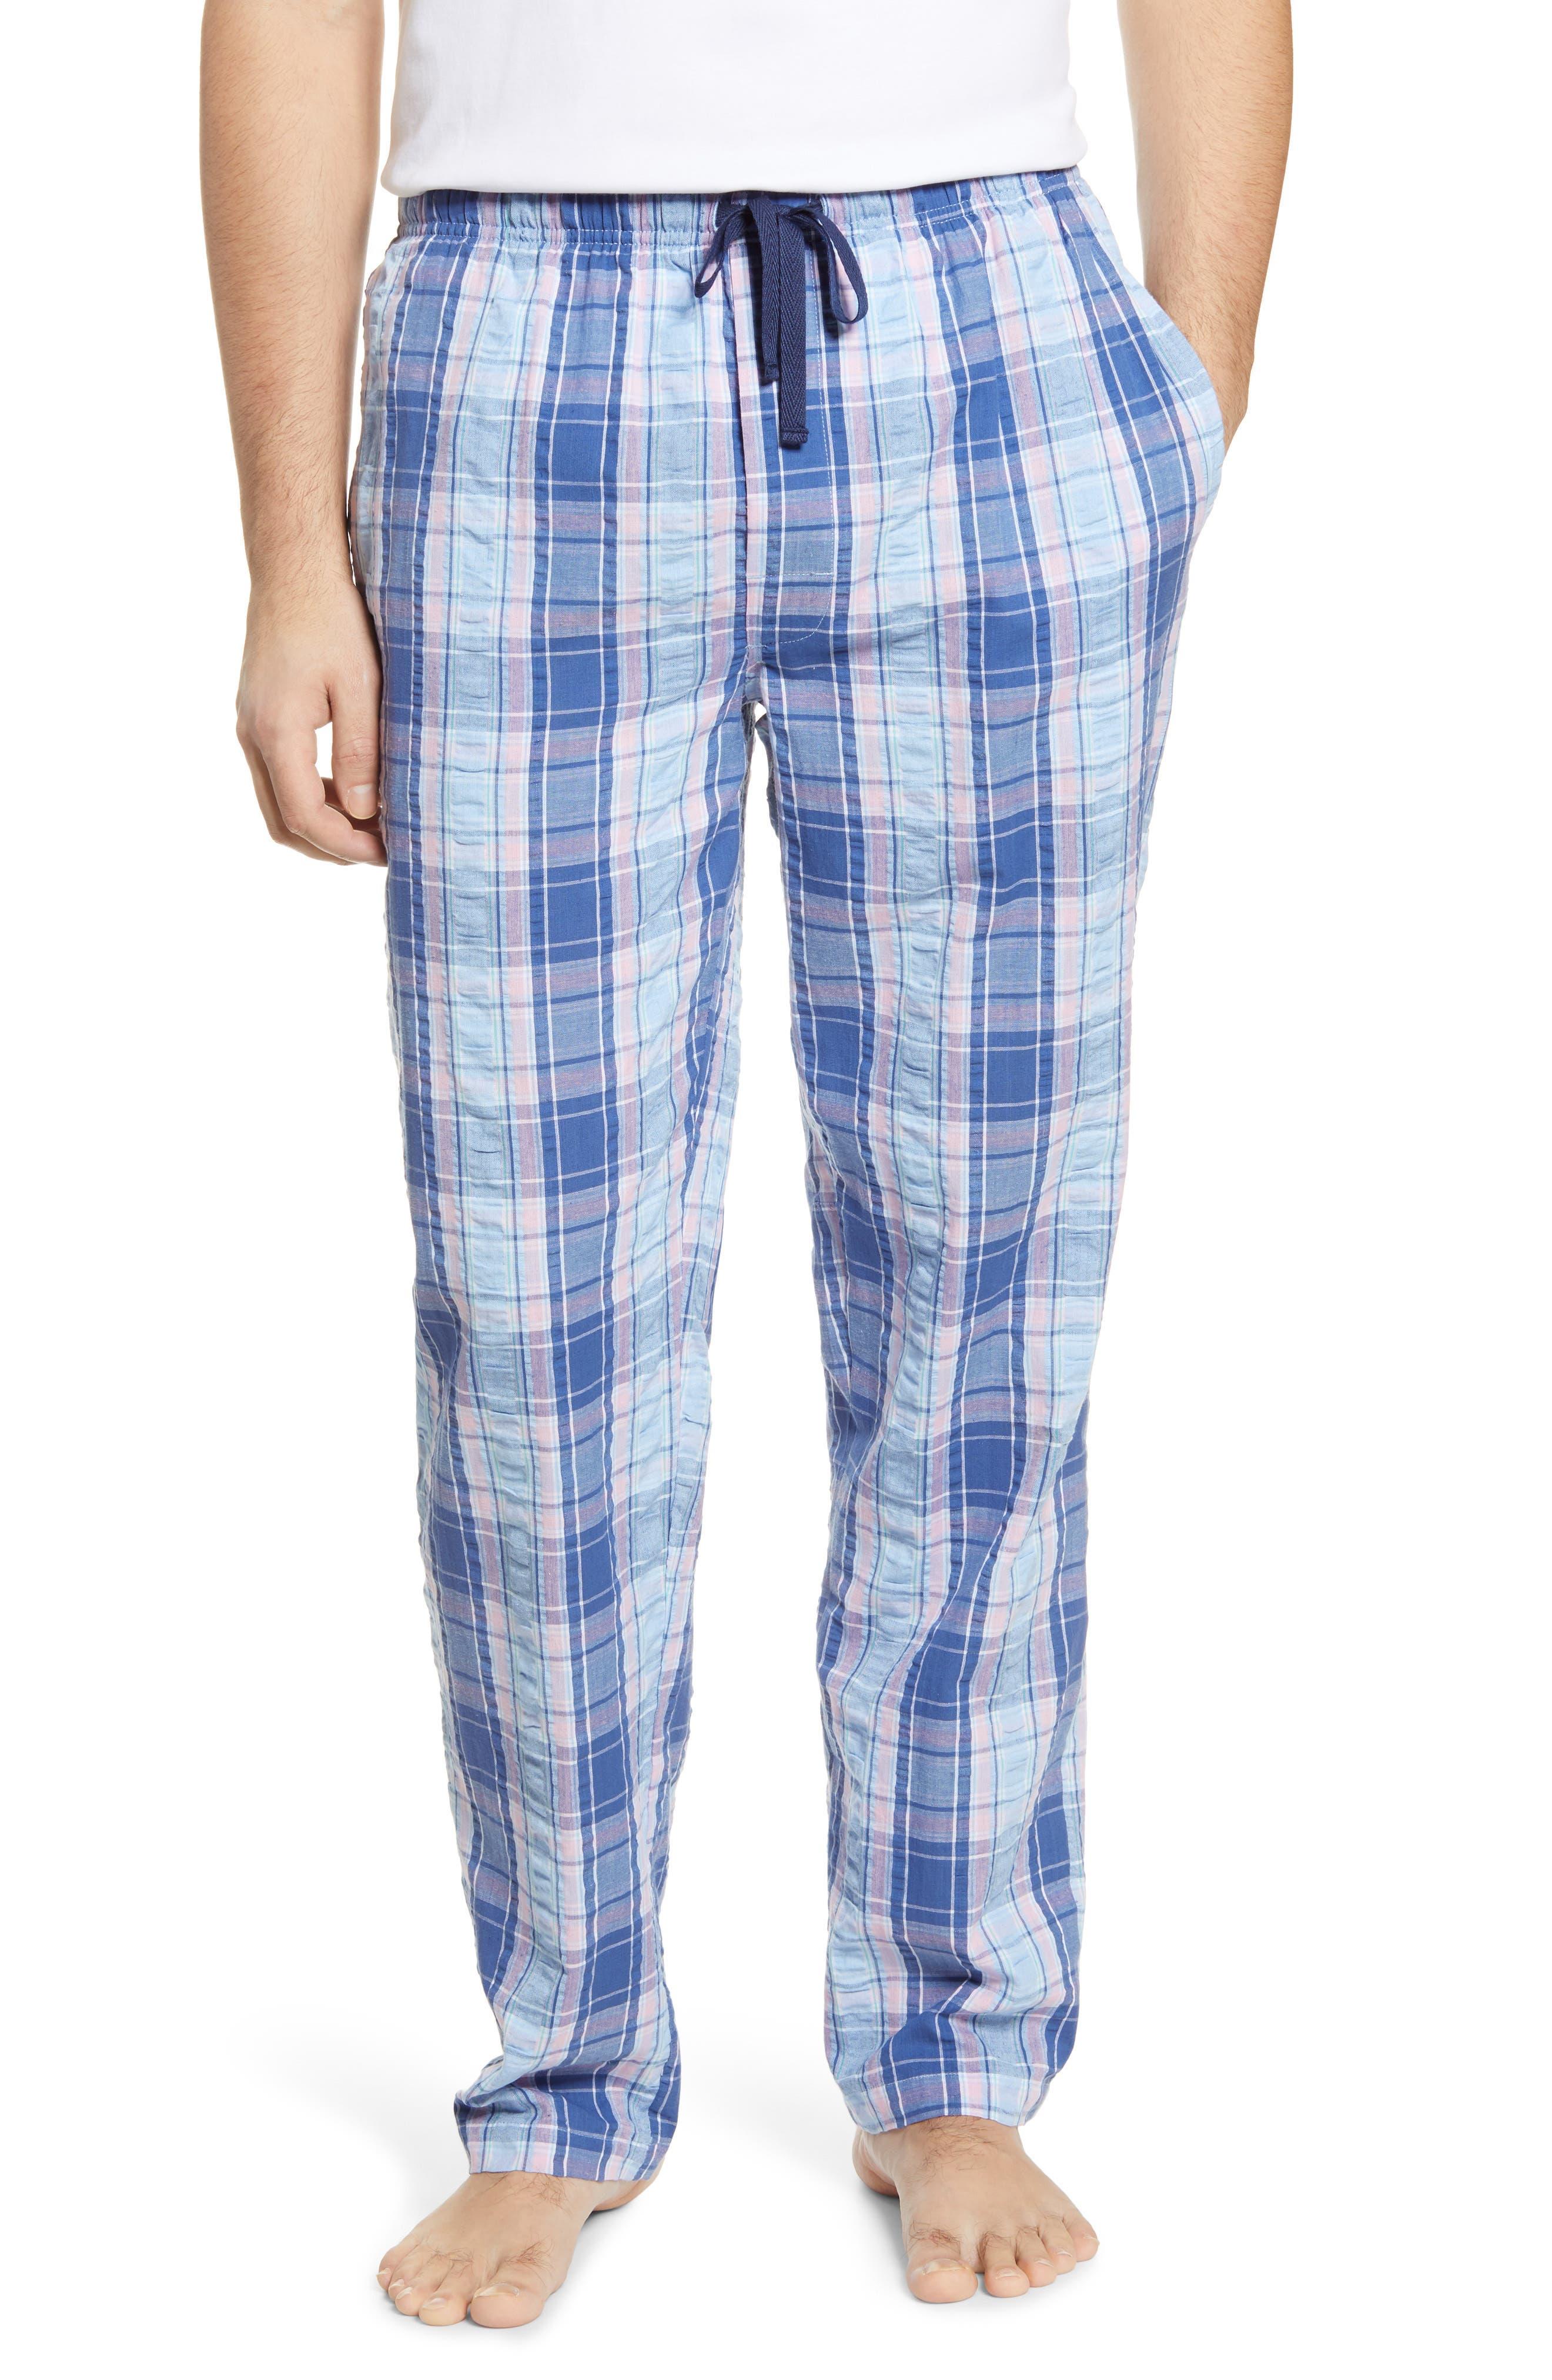 Great Lengths Seersucker Pants